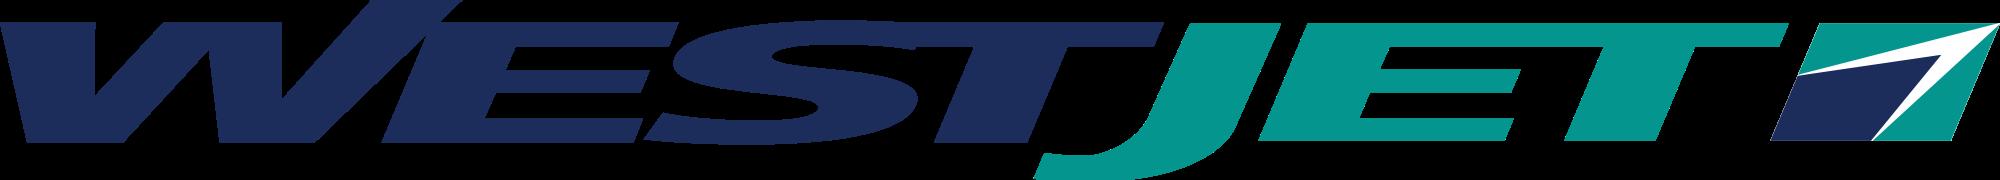 Open PlusPng.com  - Westjet Airlines Logo PNG